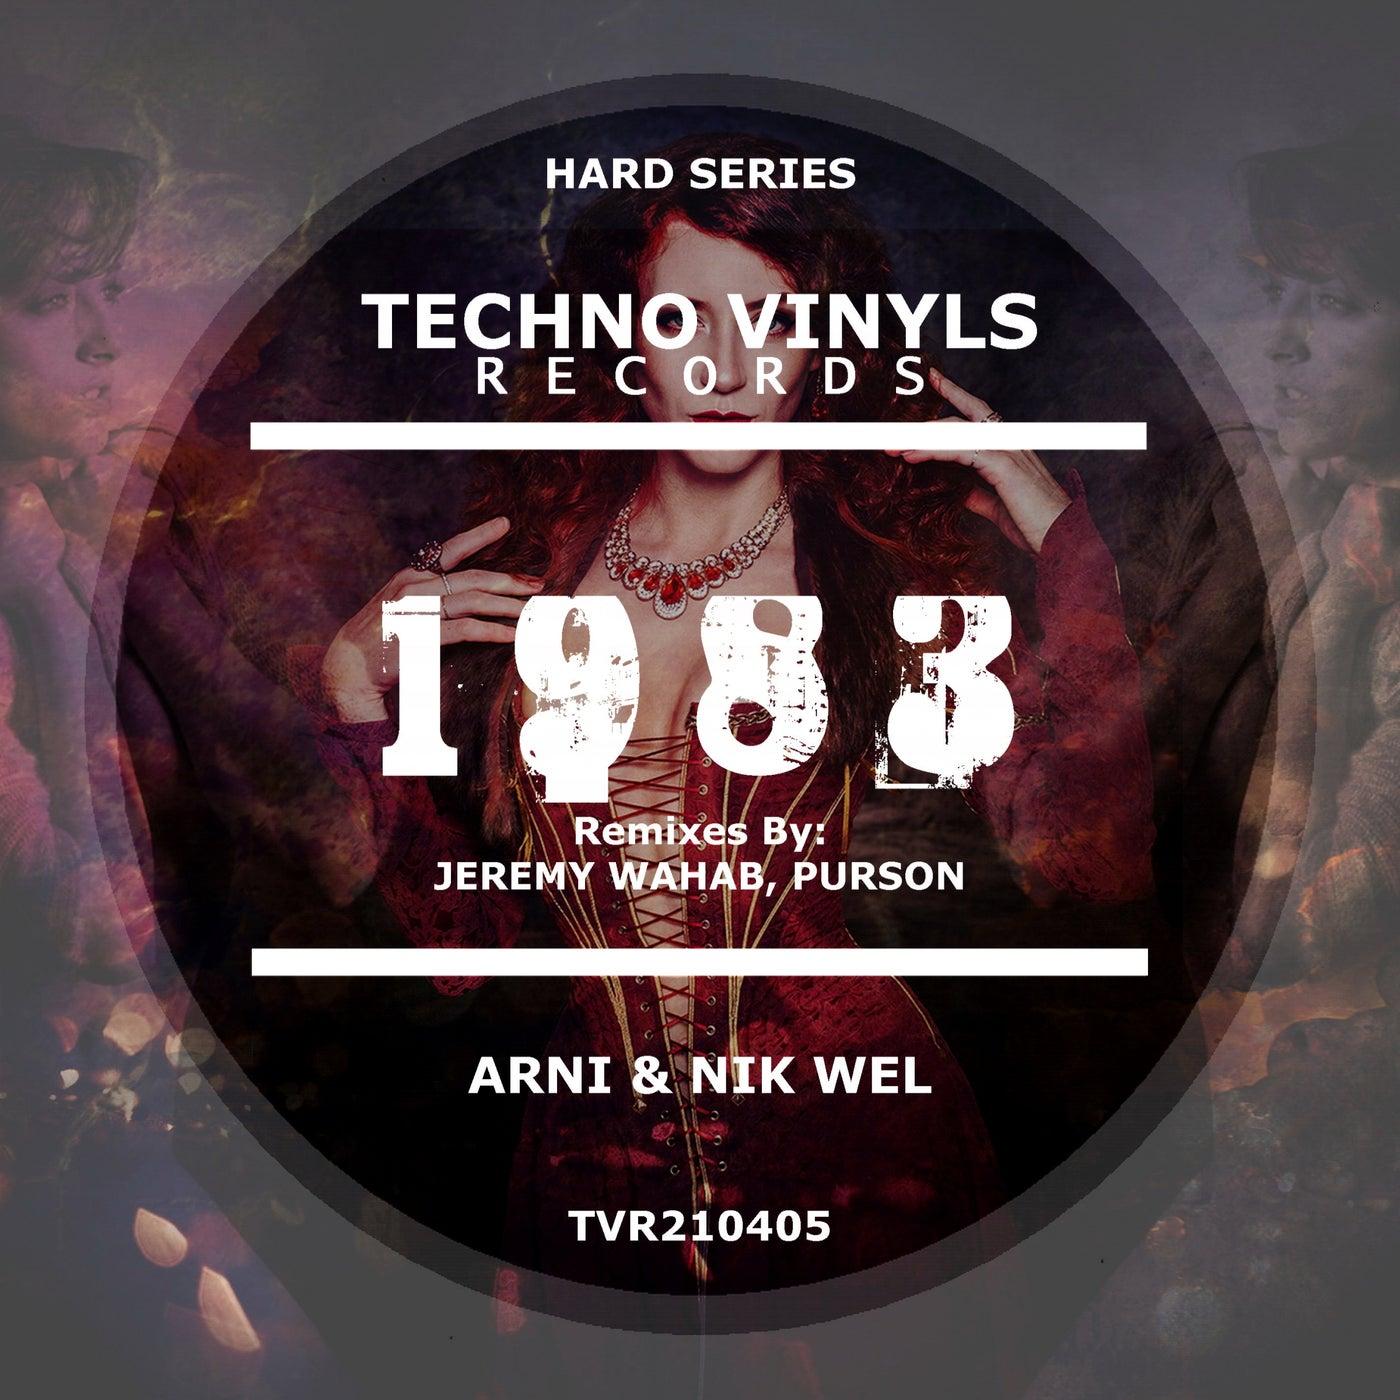 1983 (Hard Mix)